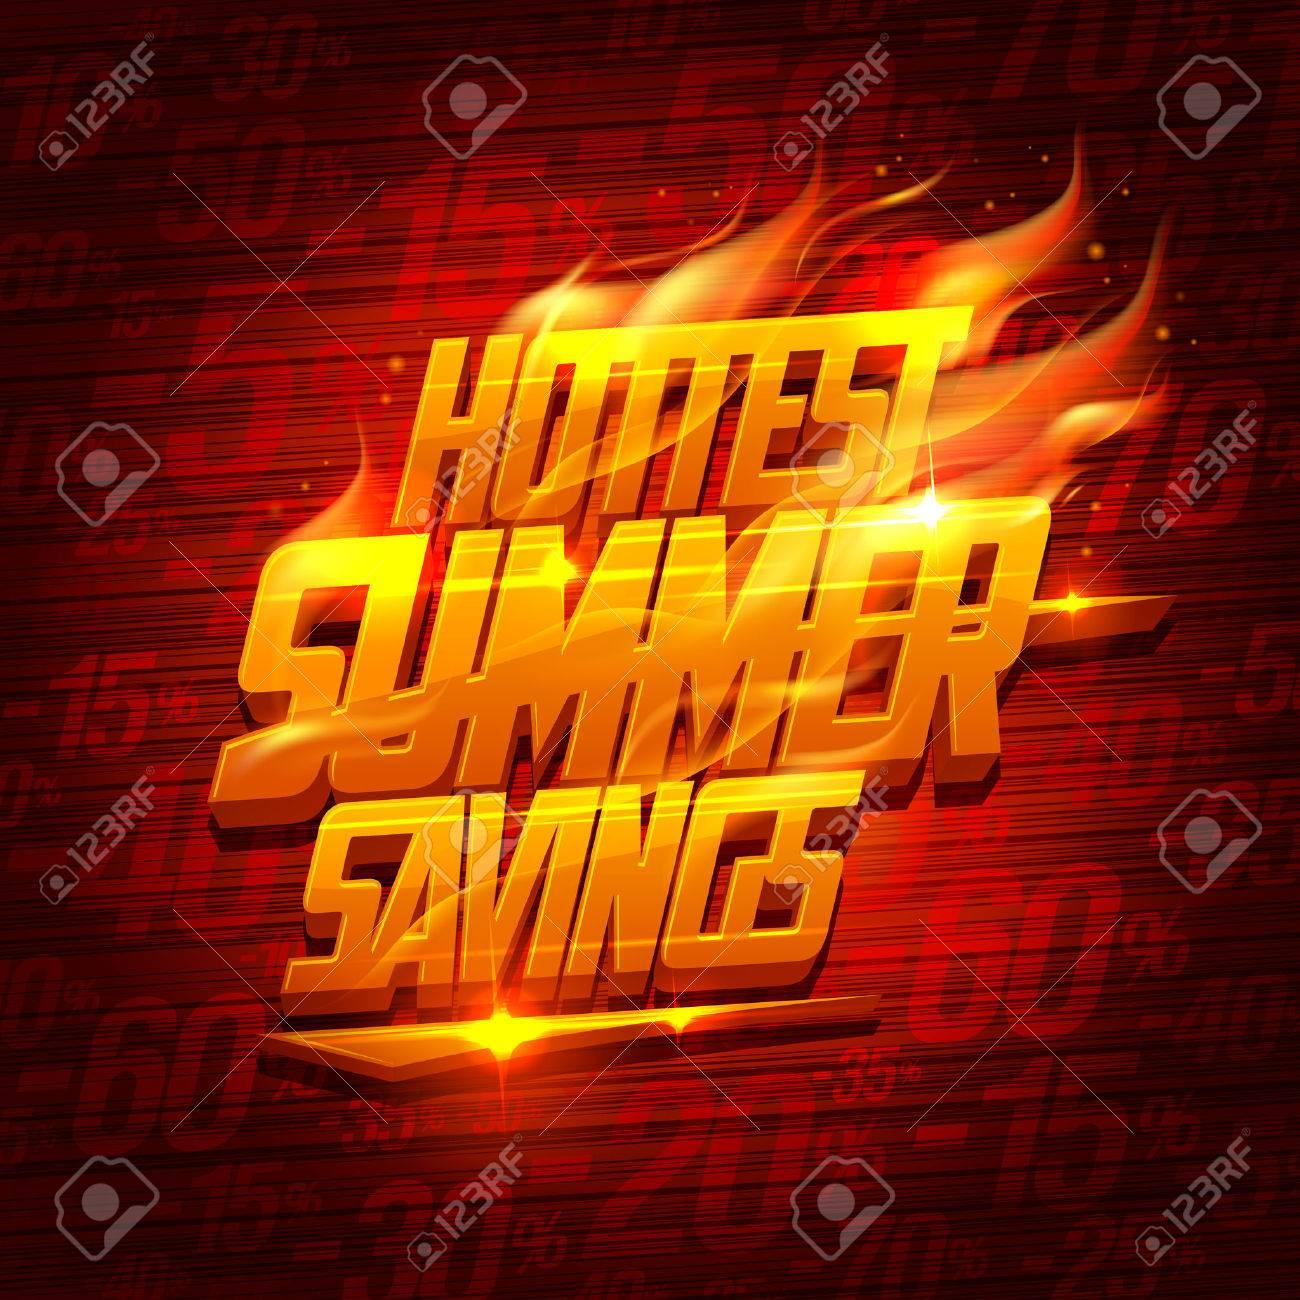 Hottest summer savings, original sale design - 58436019